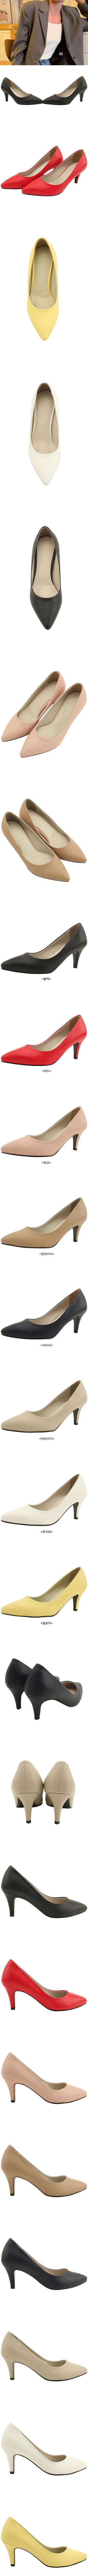 Stiletto high heel basic shoes 7cm navy